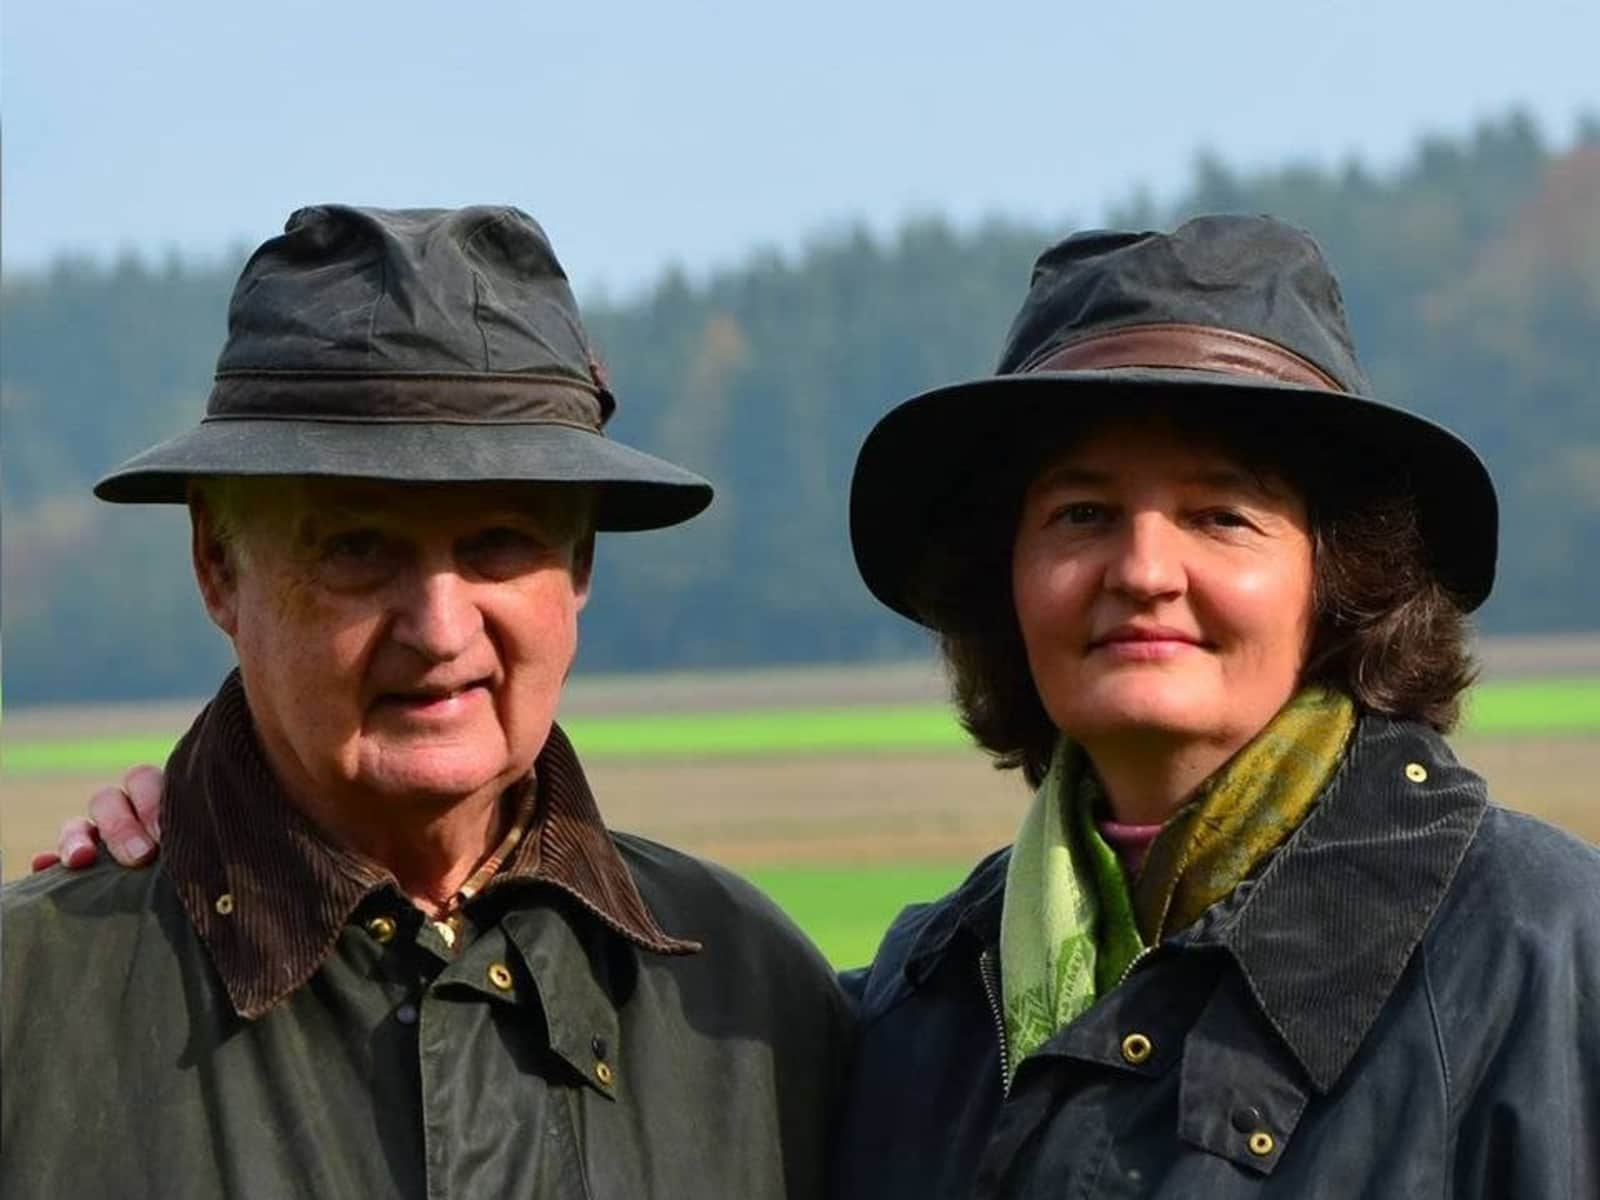 Nicola & Chris from Prien am Chiemsee, Germany